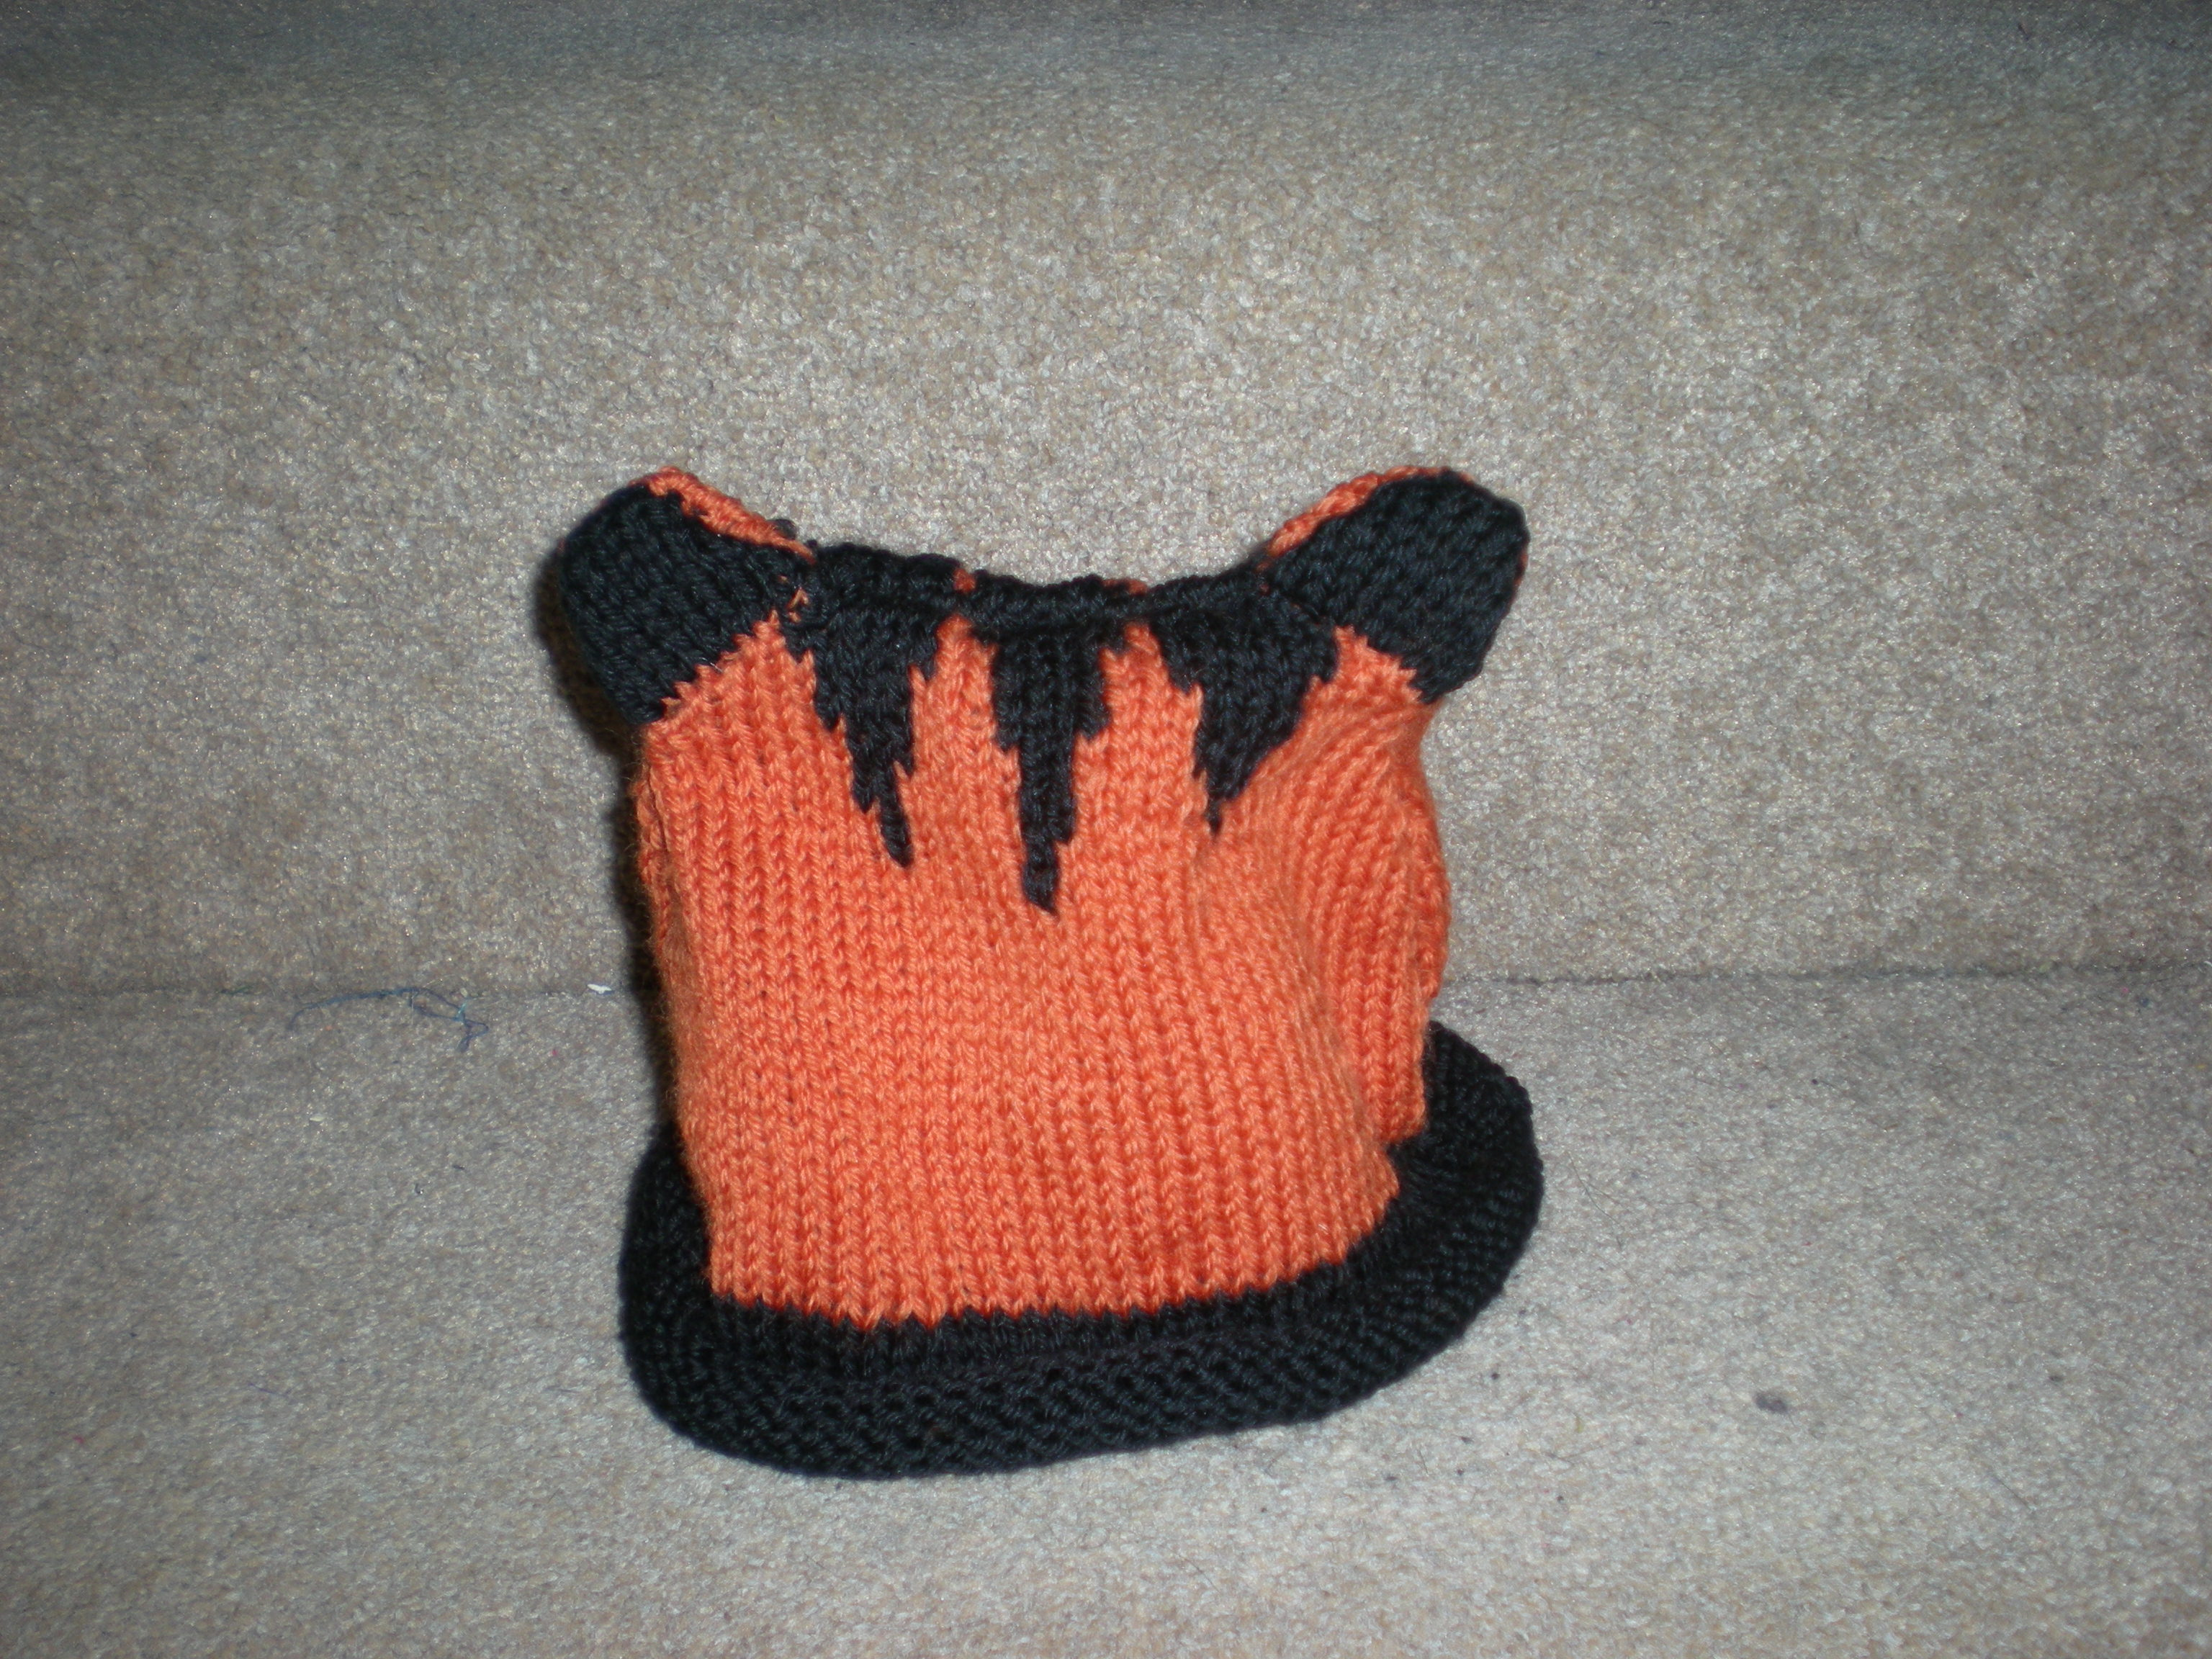 Tiger Hat, no feet